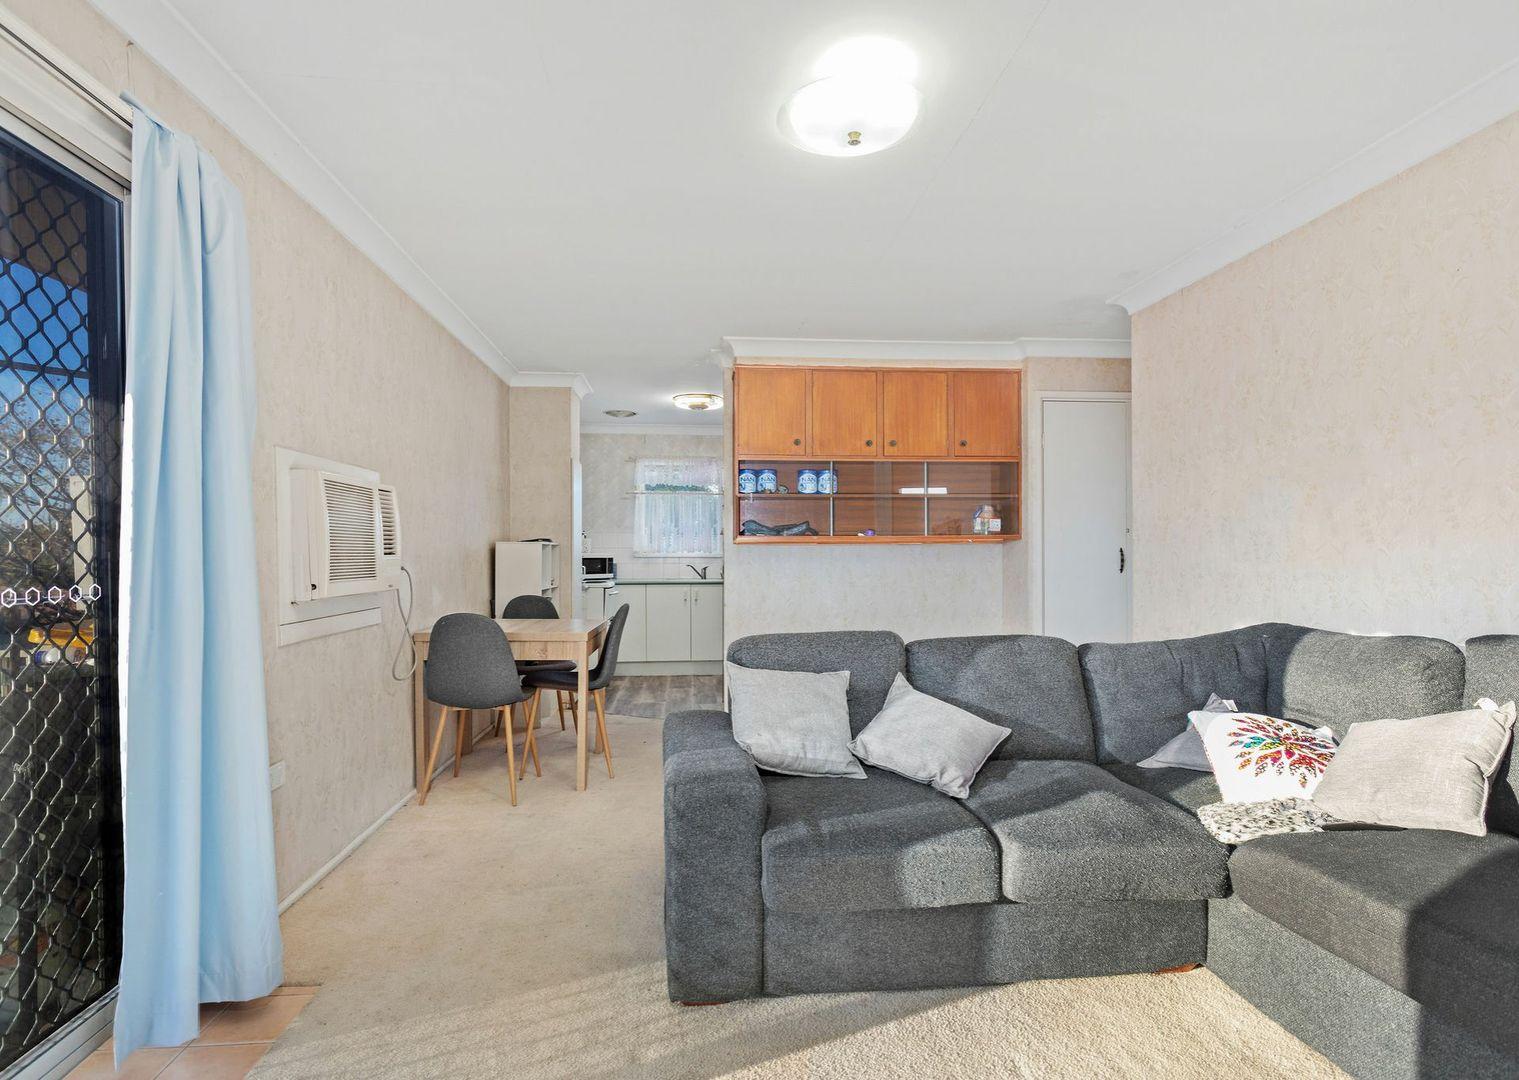 4/55 Wynter Street, Taree NSW 2430, Image 1